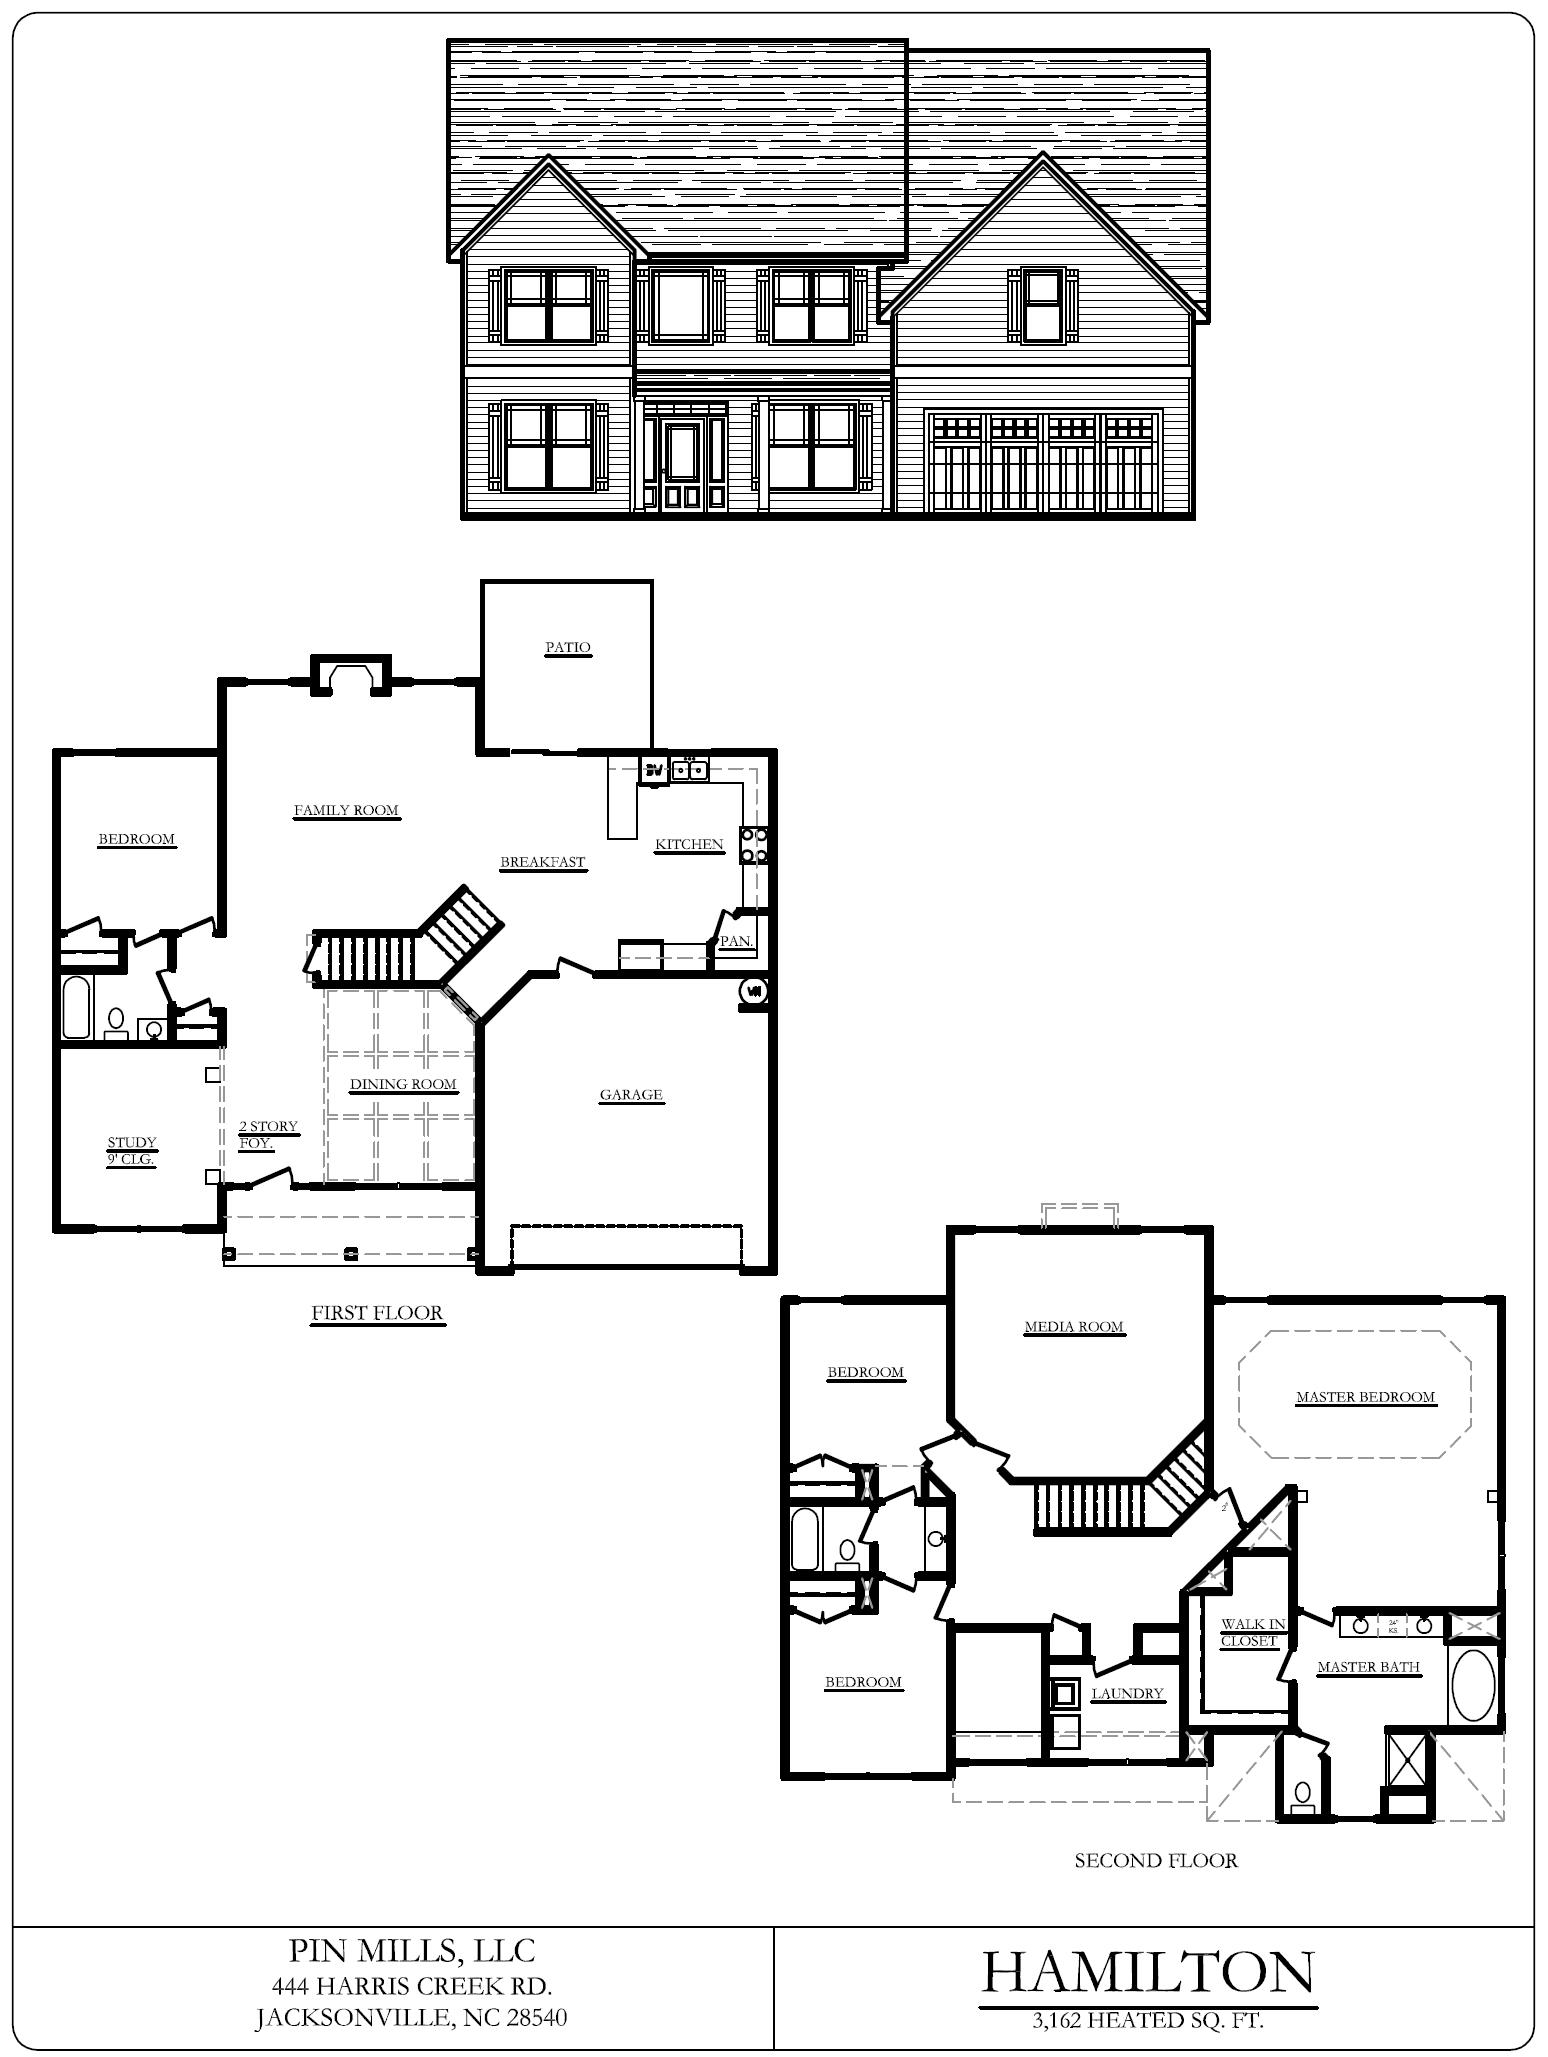 flooplan blueprints for the Southwest Plantation Hamilton home